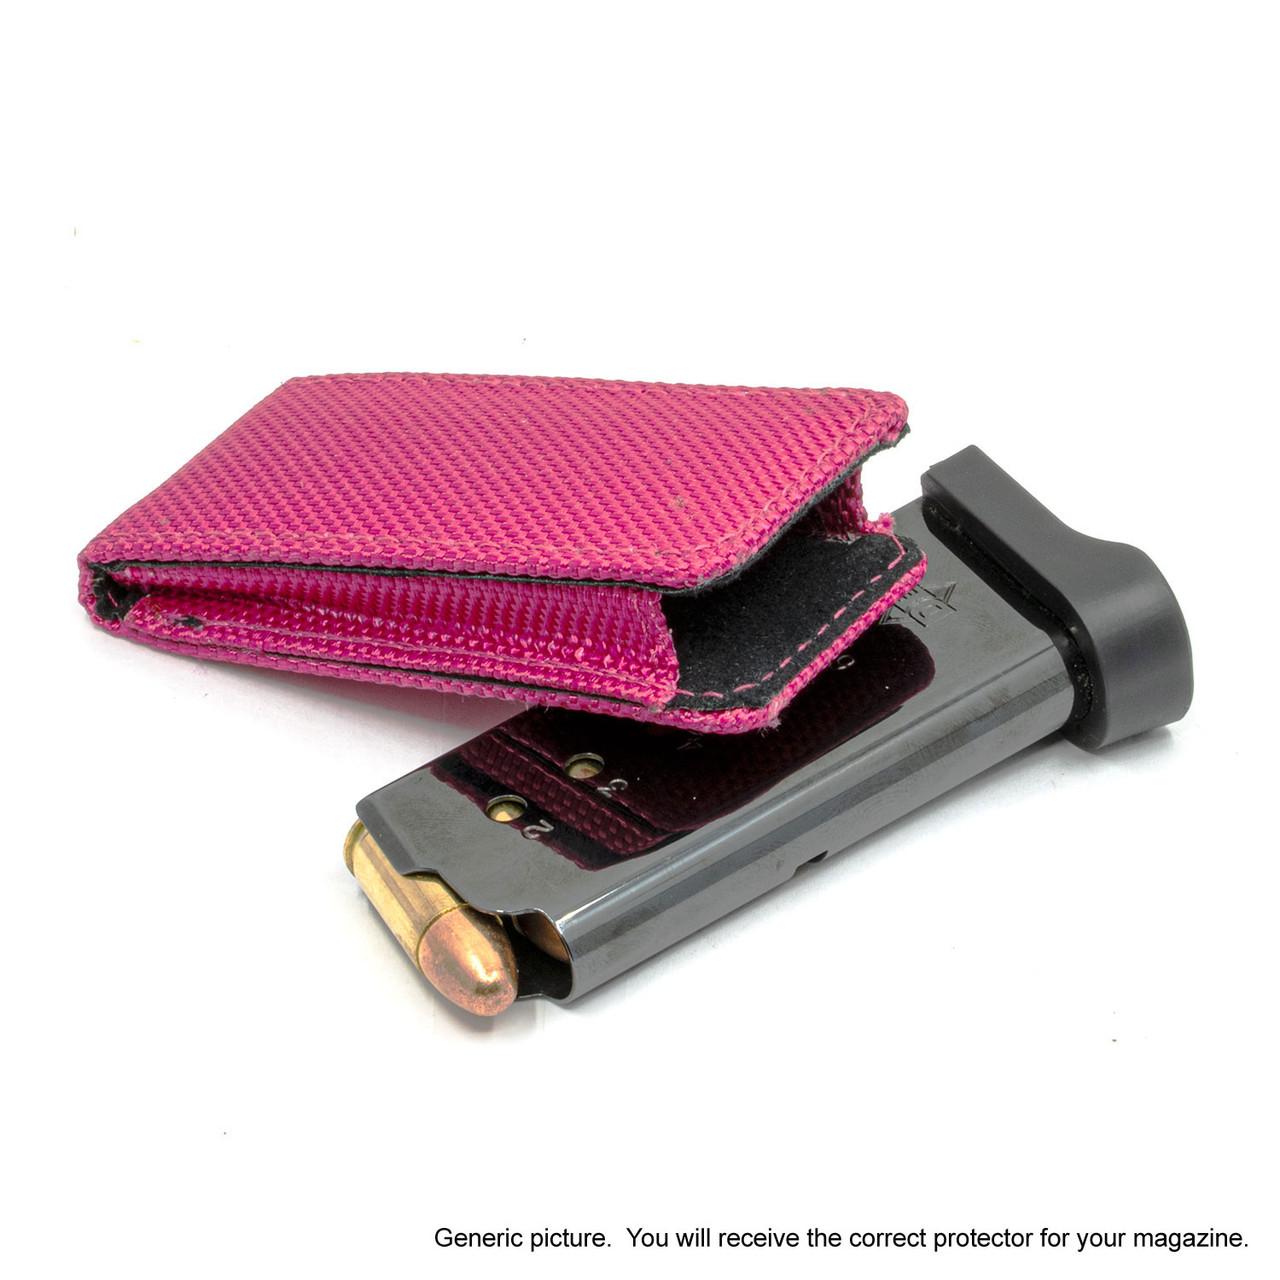 Remington R51 Pink Covert Magazine Pocket Protector